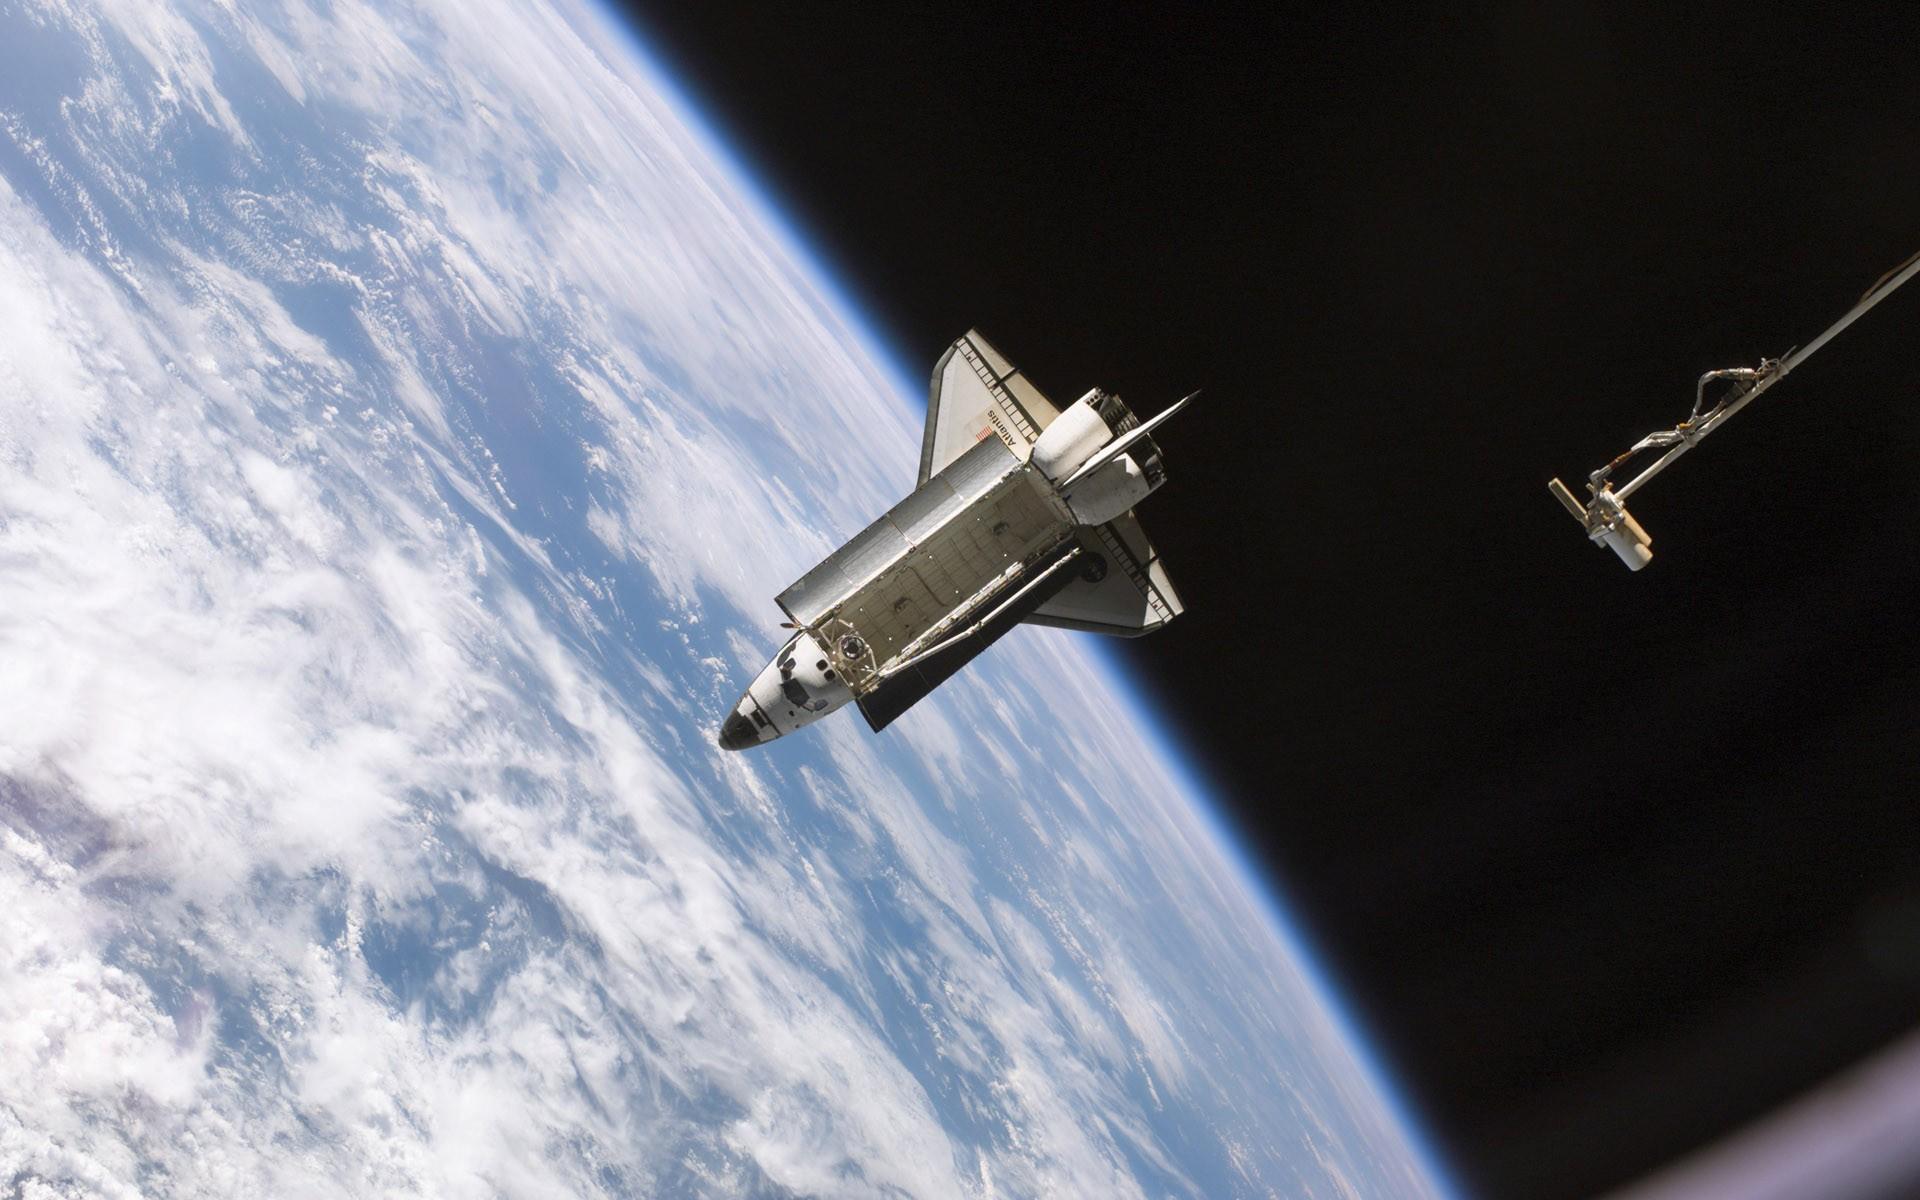 space shuttle atlantis - HD1920×1200